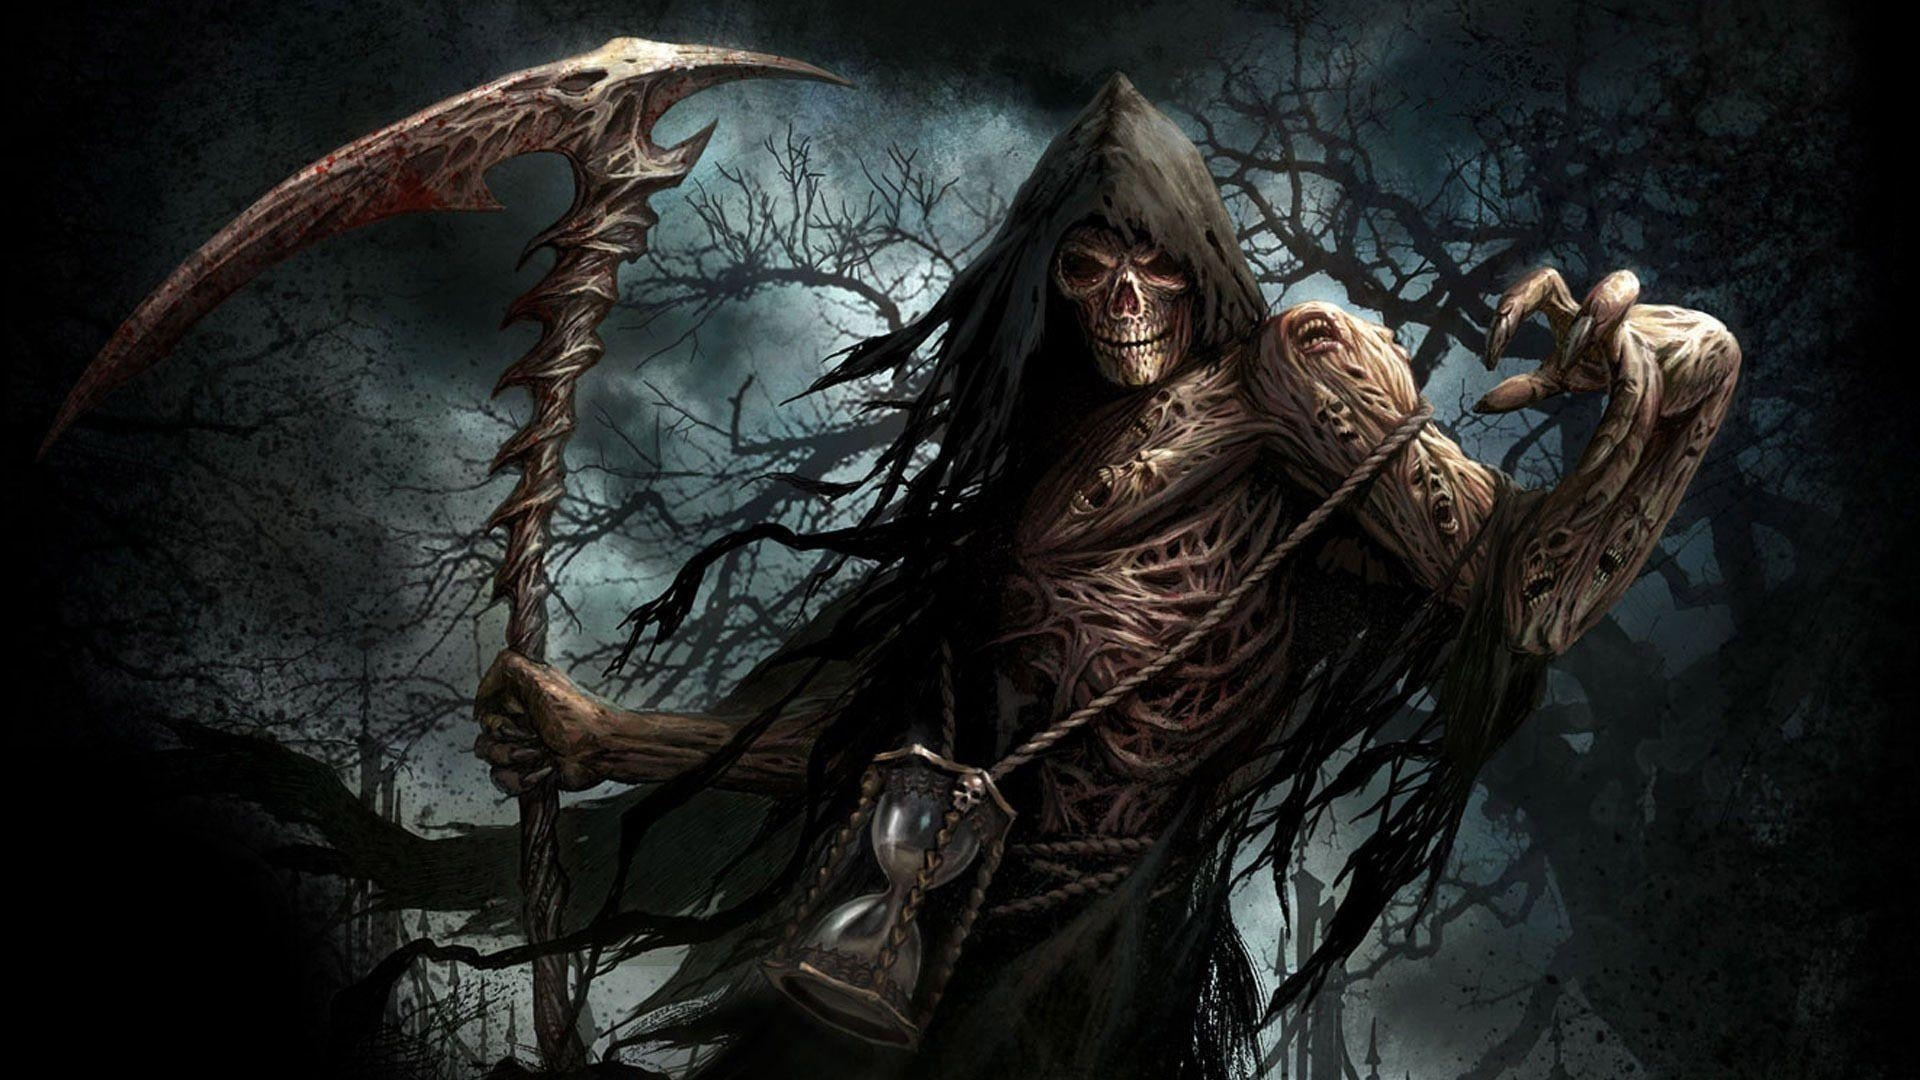 scary grim reaper hd desktop wallpaper : widescreen : high